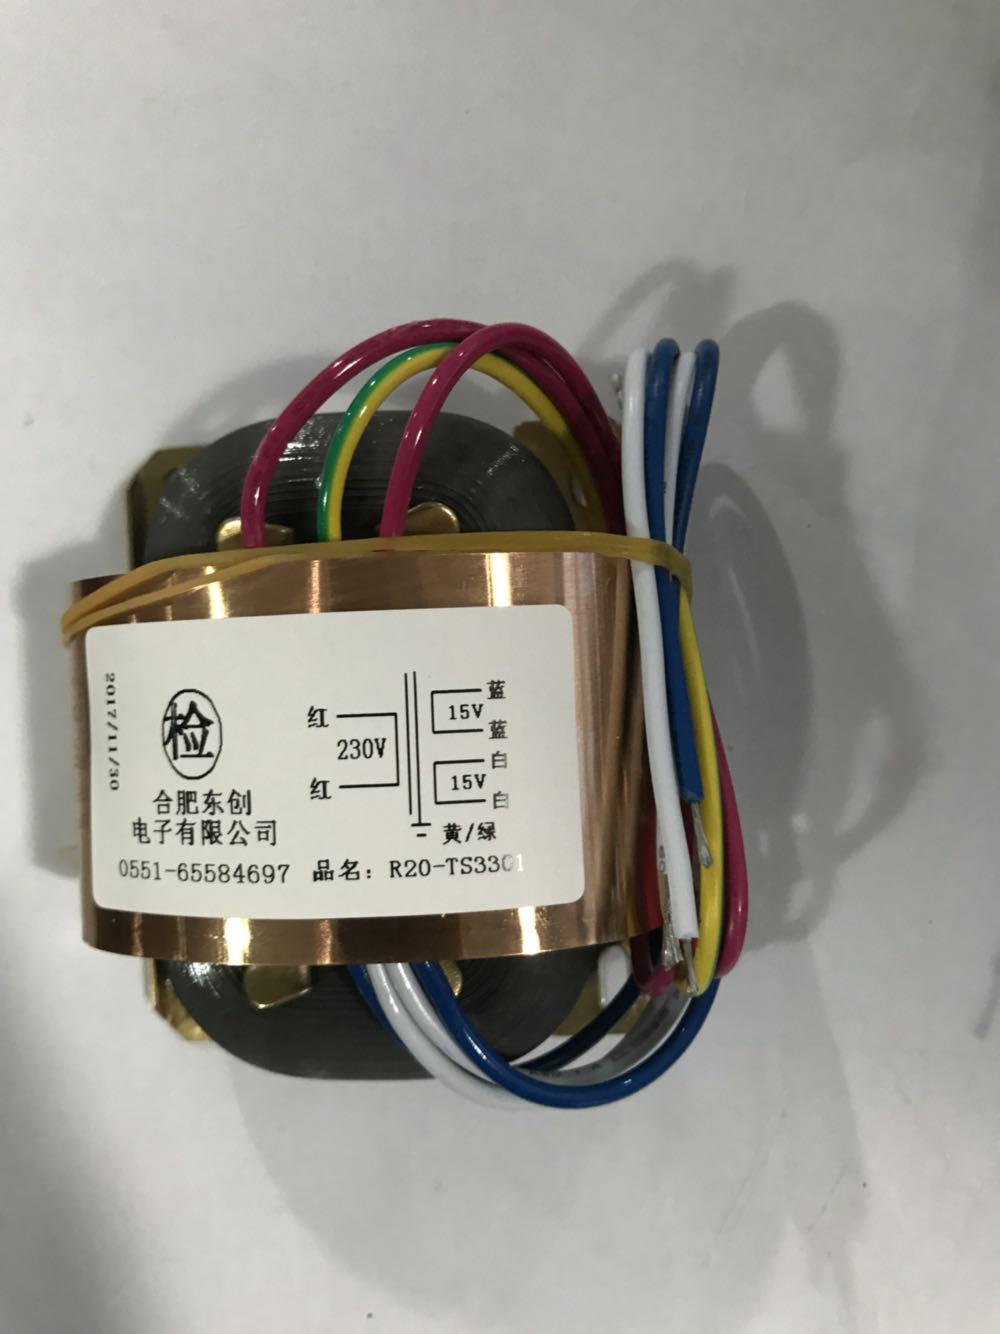 15V 1A 15V 1A Transformer R Core R20 custom transformer 220V 30VA copper shield for DAC pre-amplifier HIFI decoder